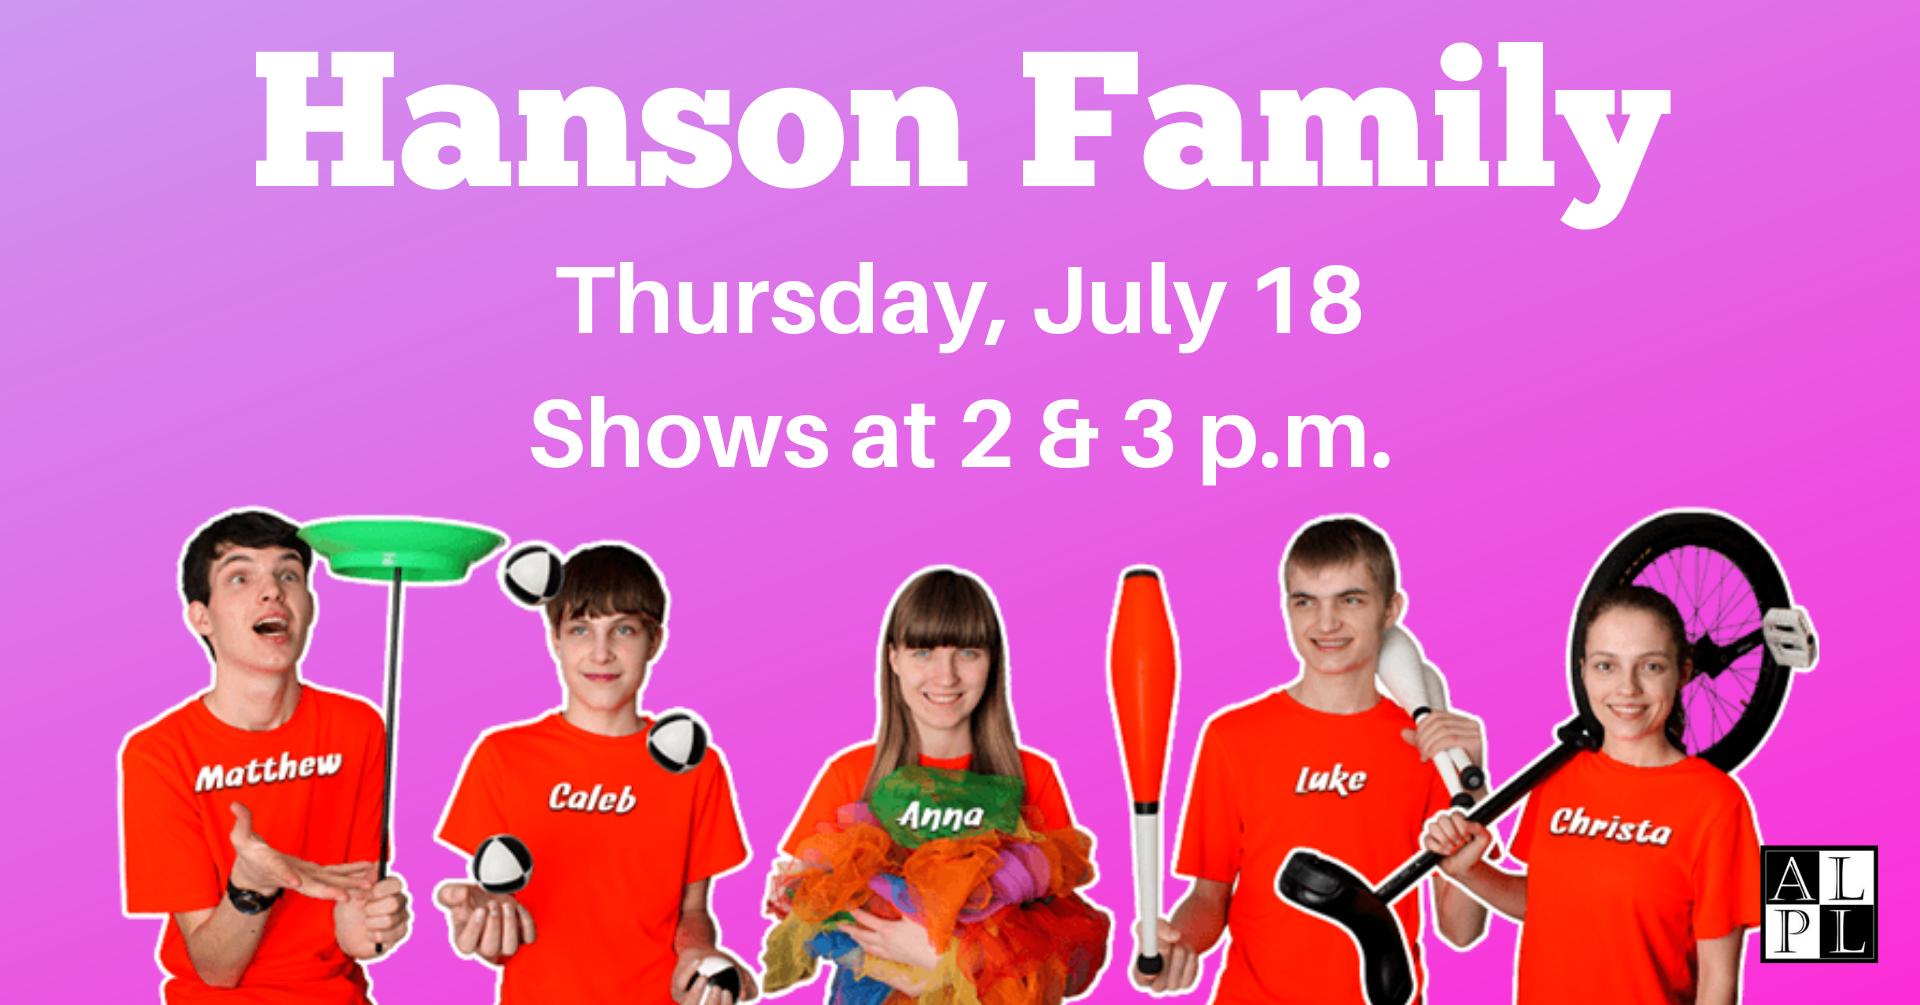 Facebook Event - Hanson Family